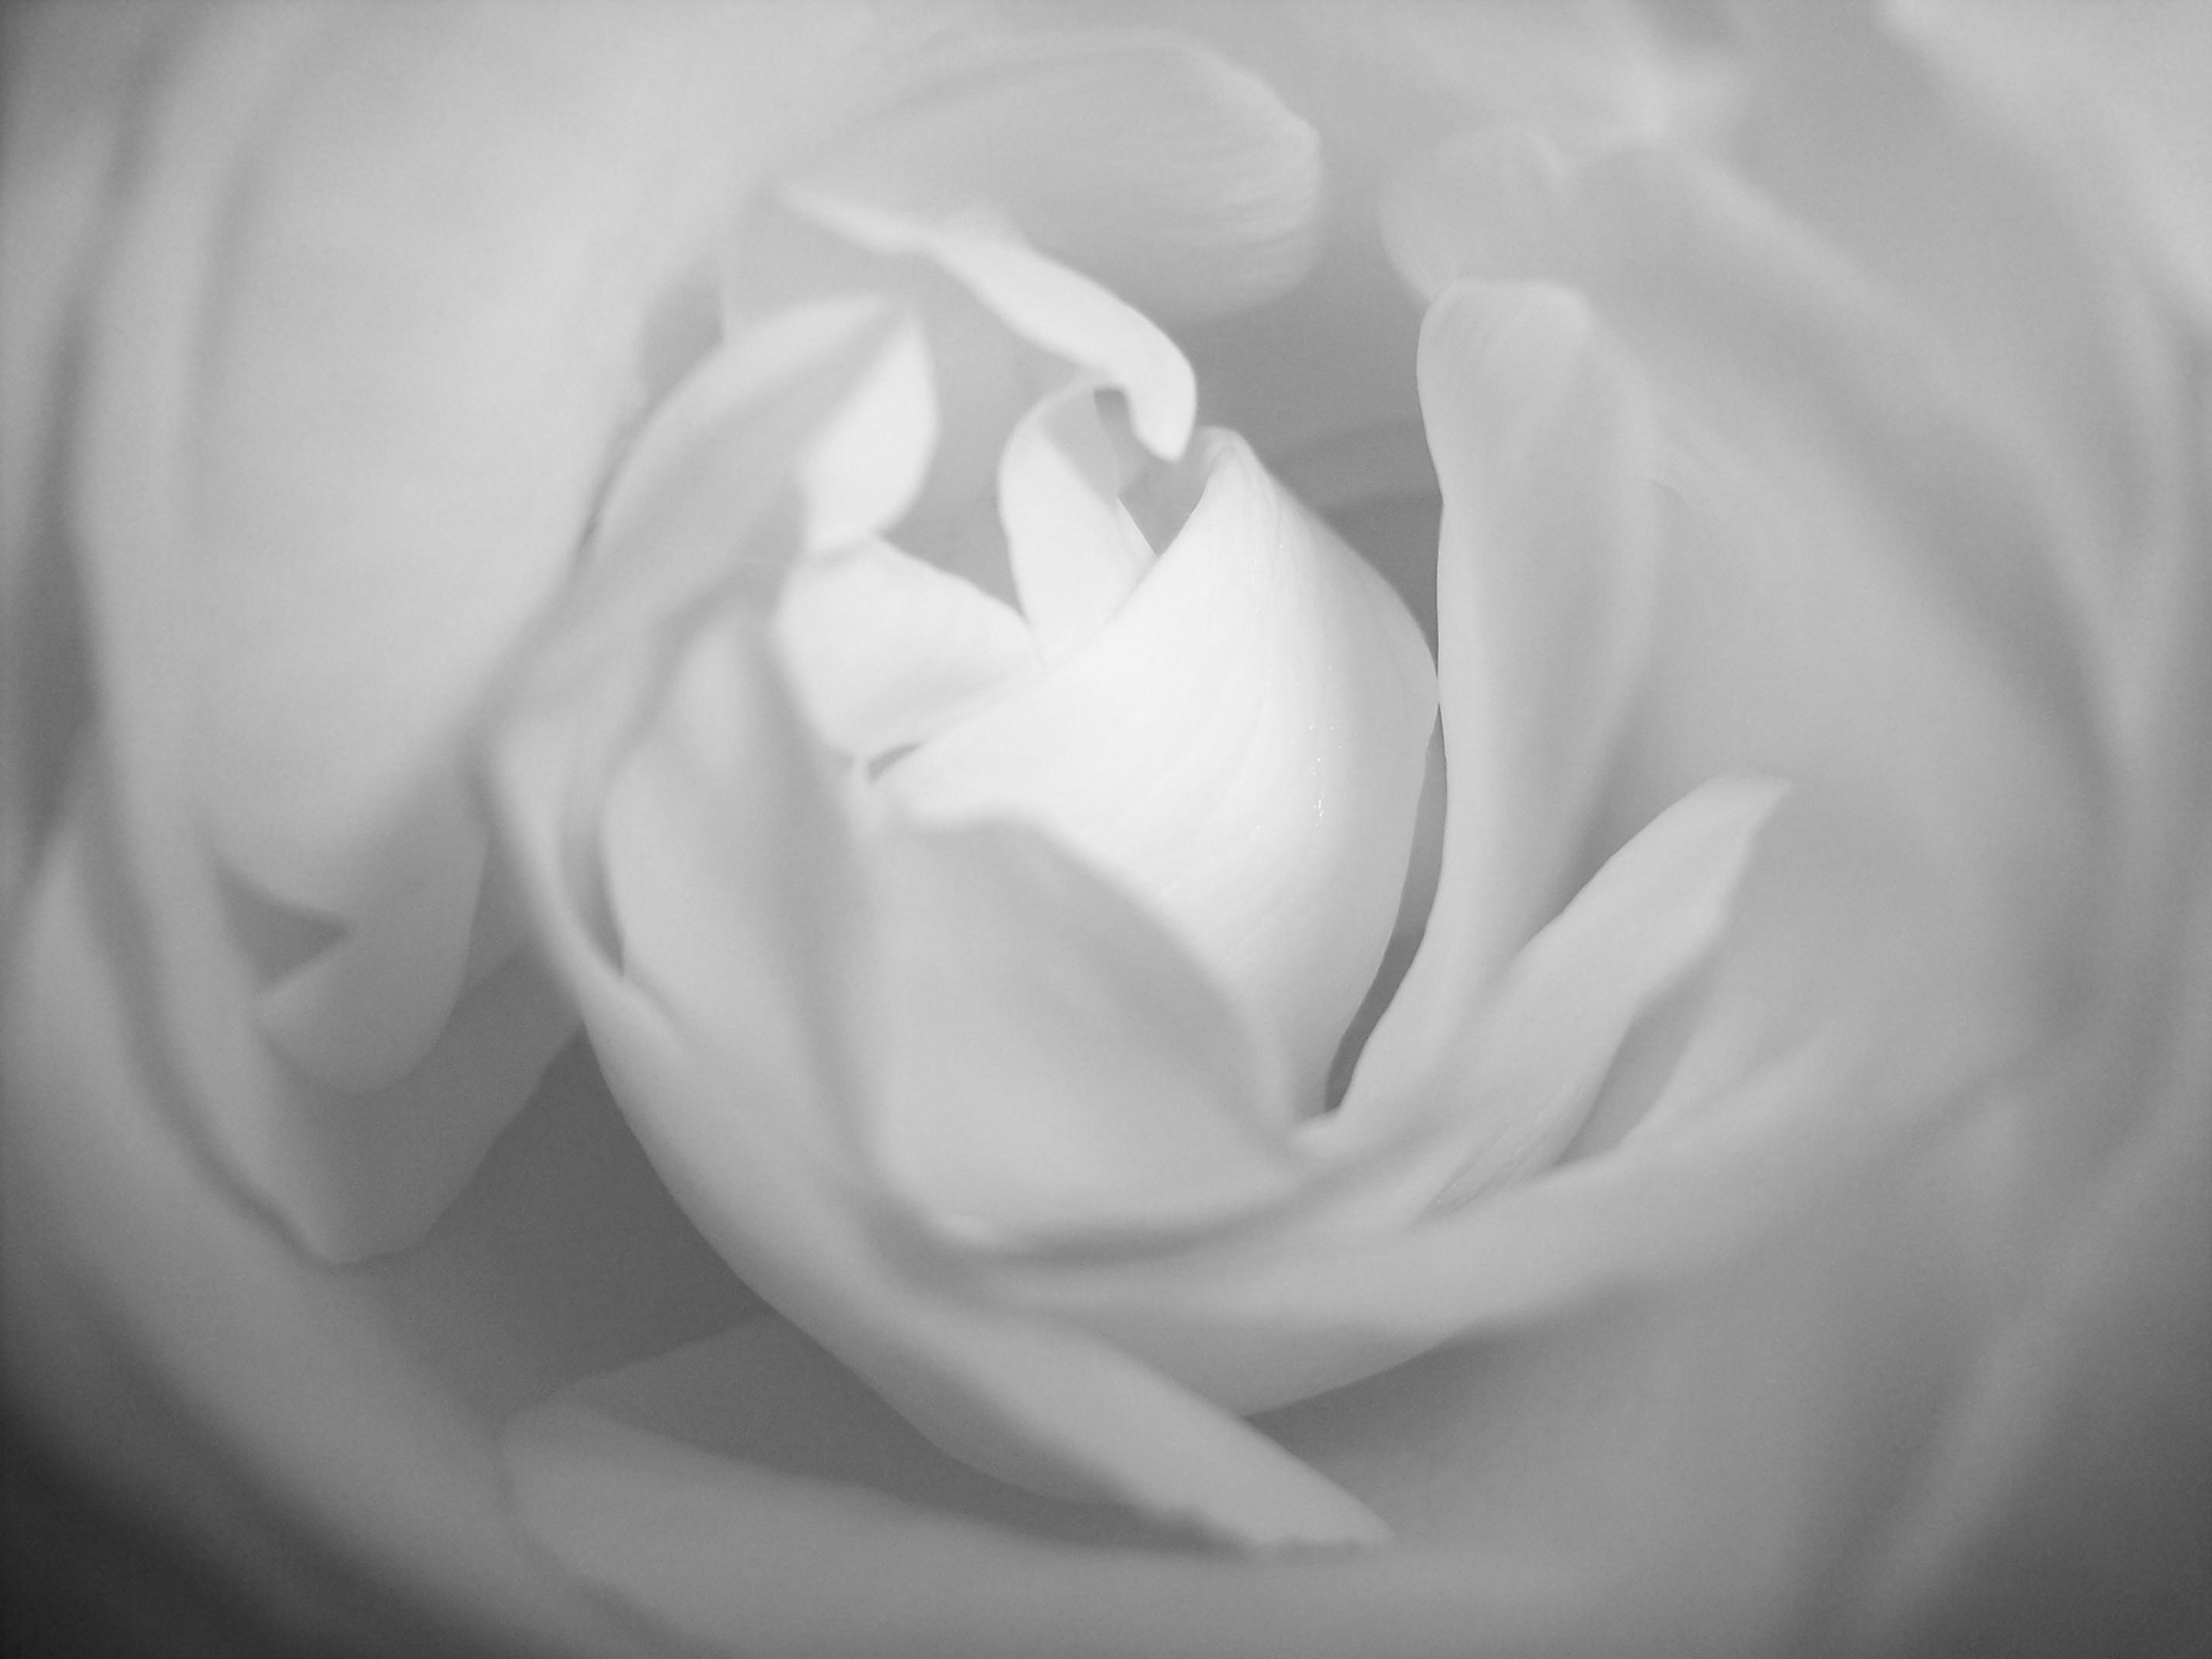 Heart Healings aromatherapy